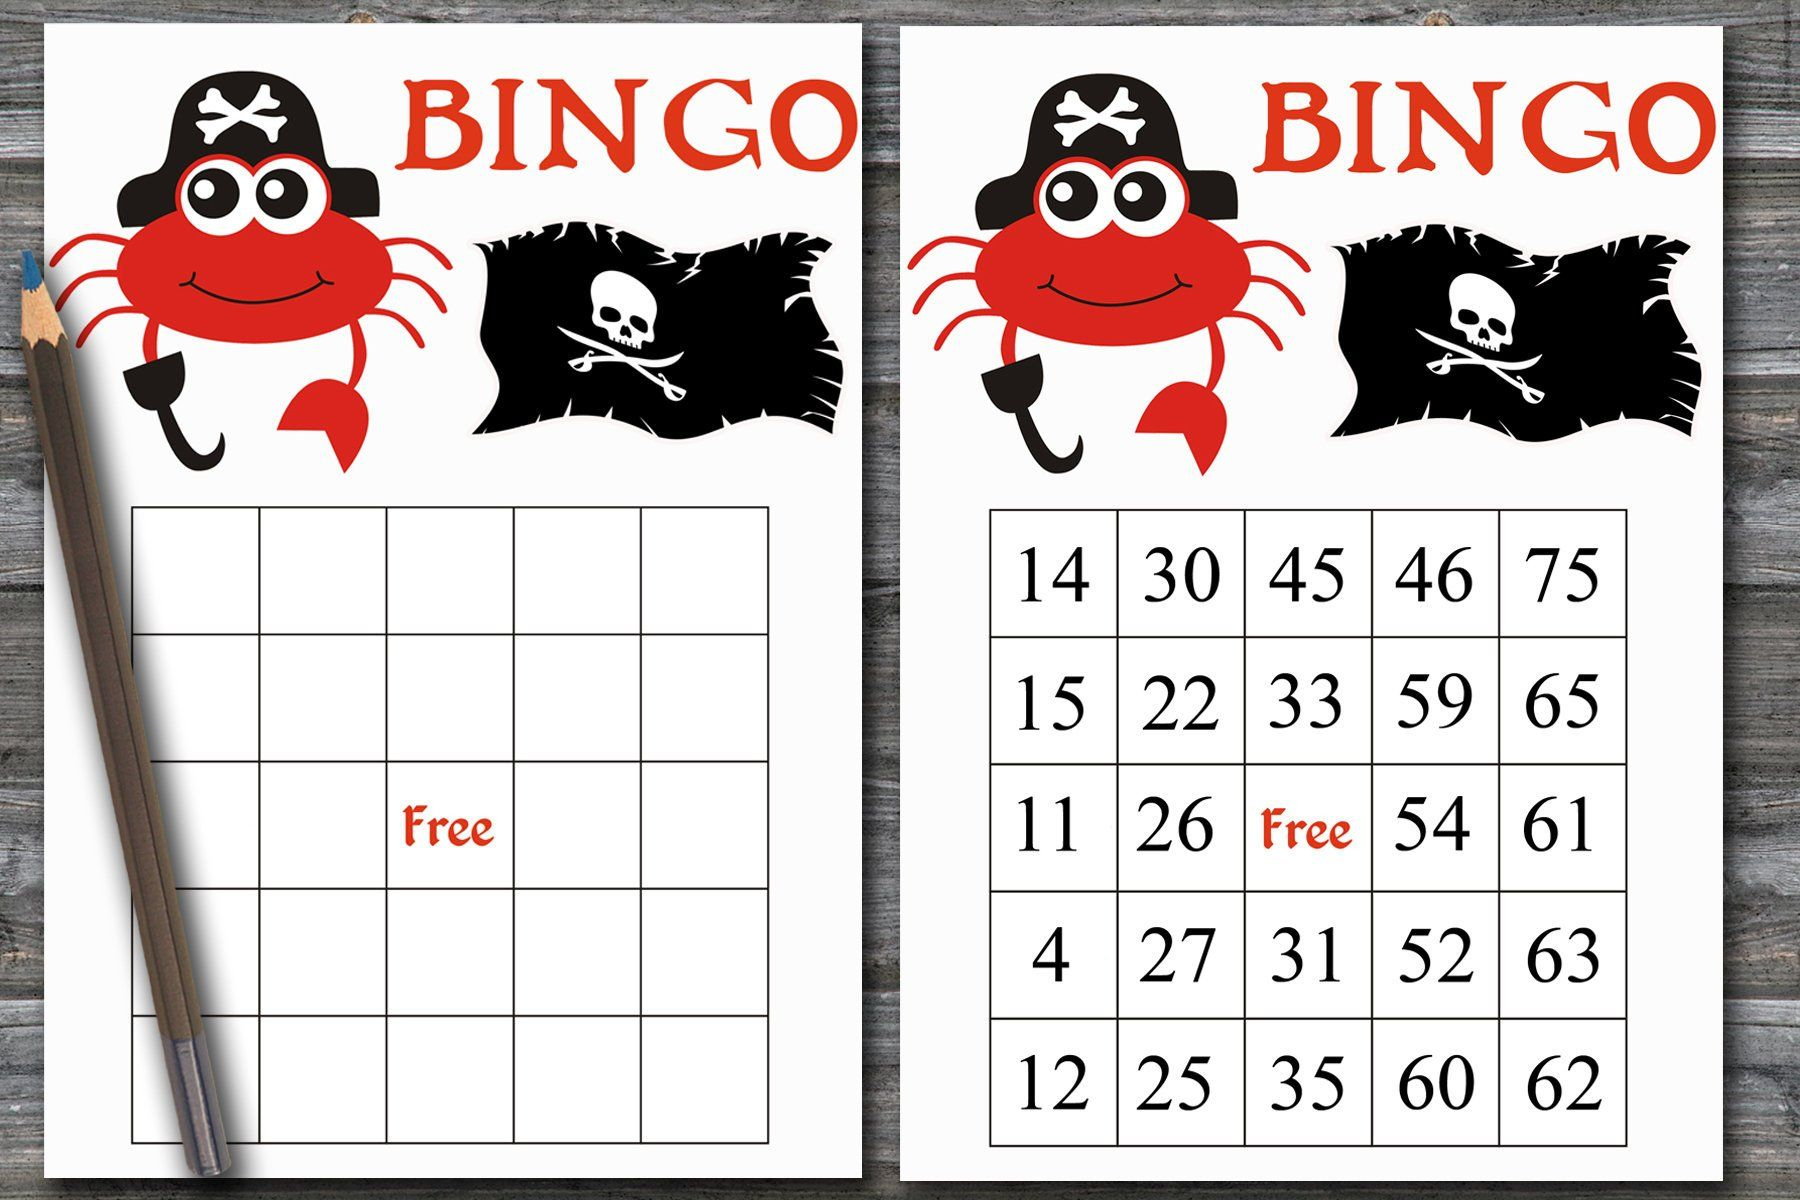 60 Pirate Bingo Cards With Numbers, Crab Bingo Game, Pirate